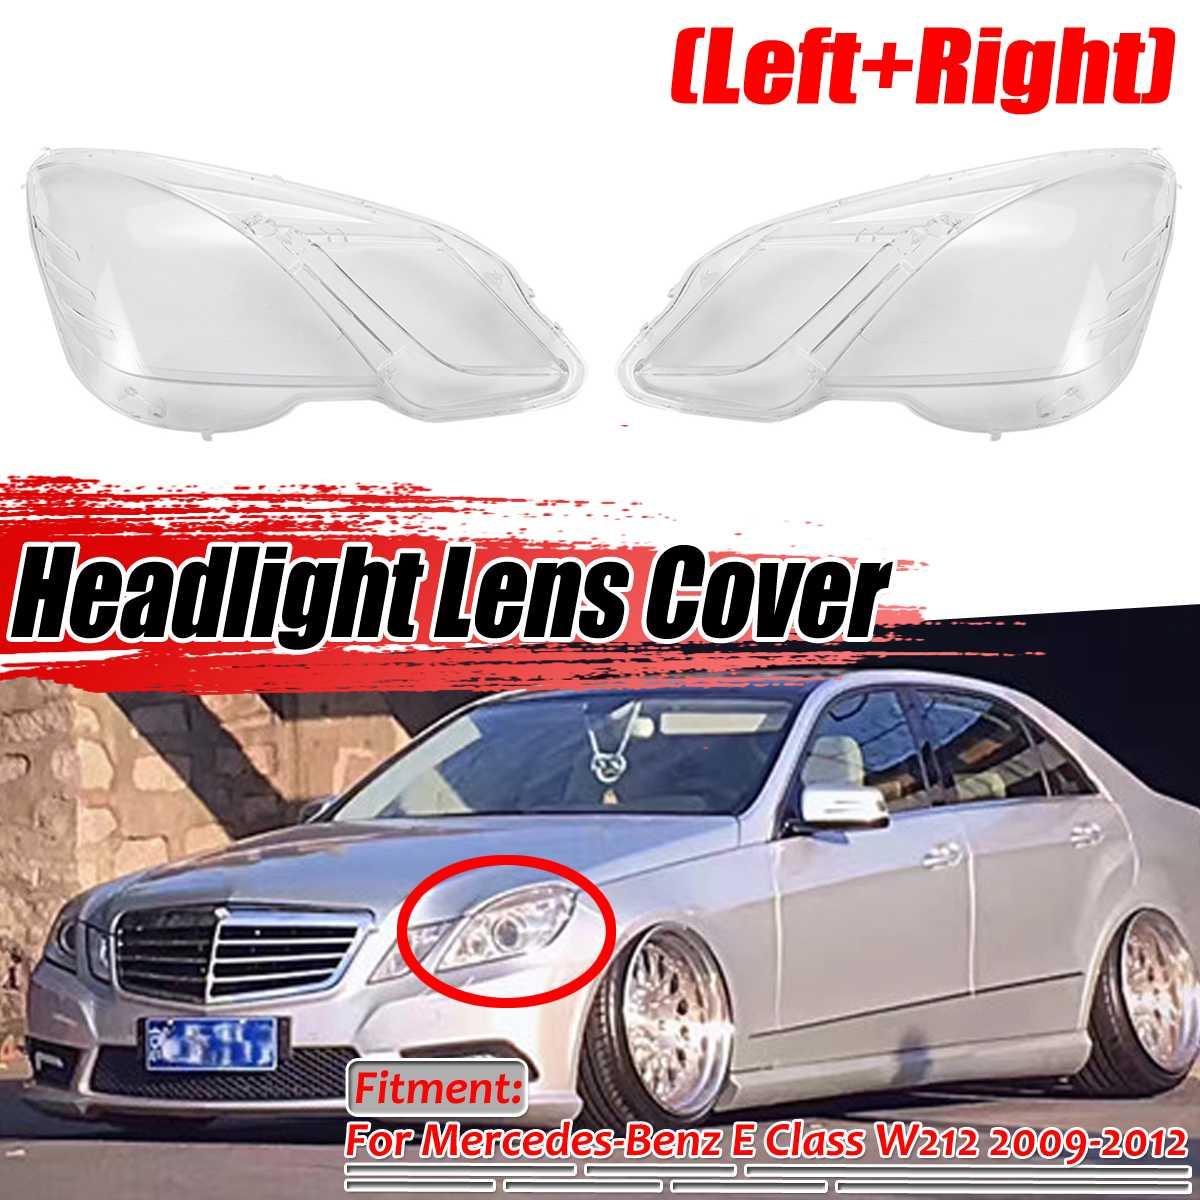 Right Side Mirror Housing for 2003-2009 Mercedes W211 E200 E240 E320 E280 E420